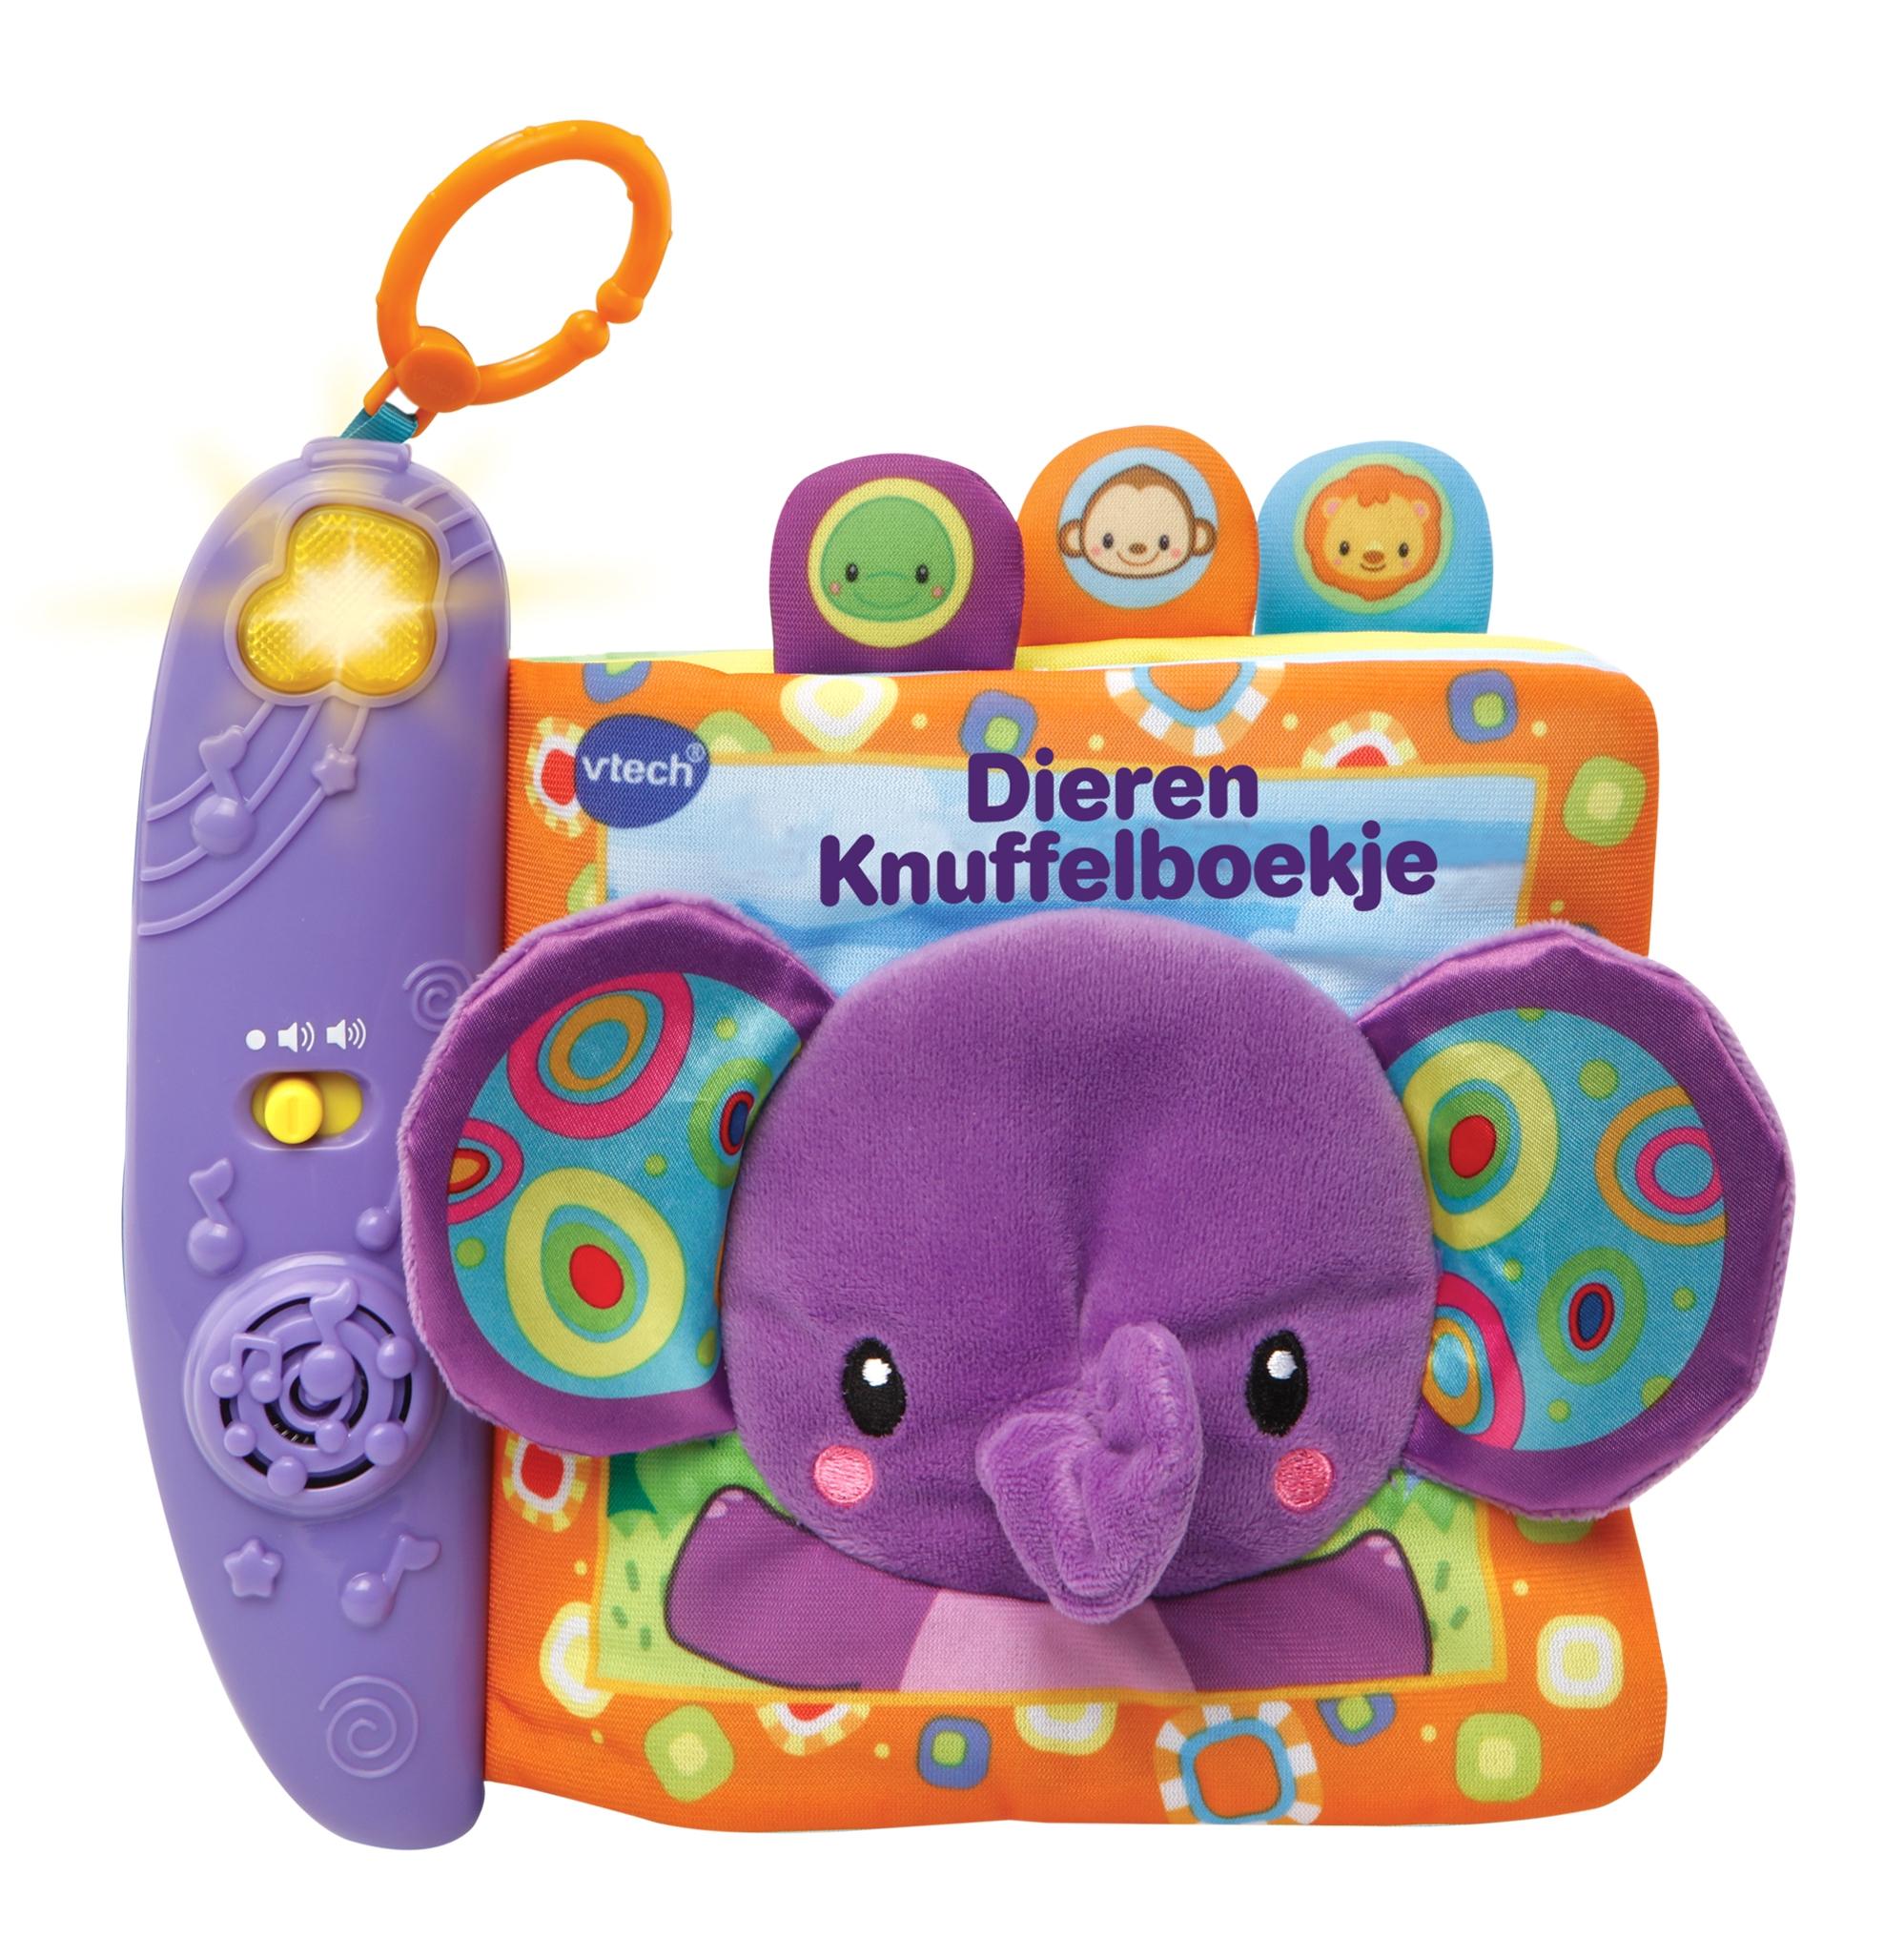 VTech Baby Dieren Knuffelboekje Ragazzo/Ragazza giocattolo educativo